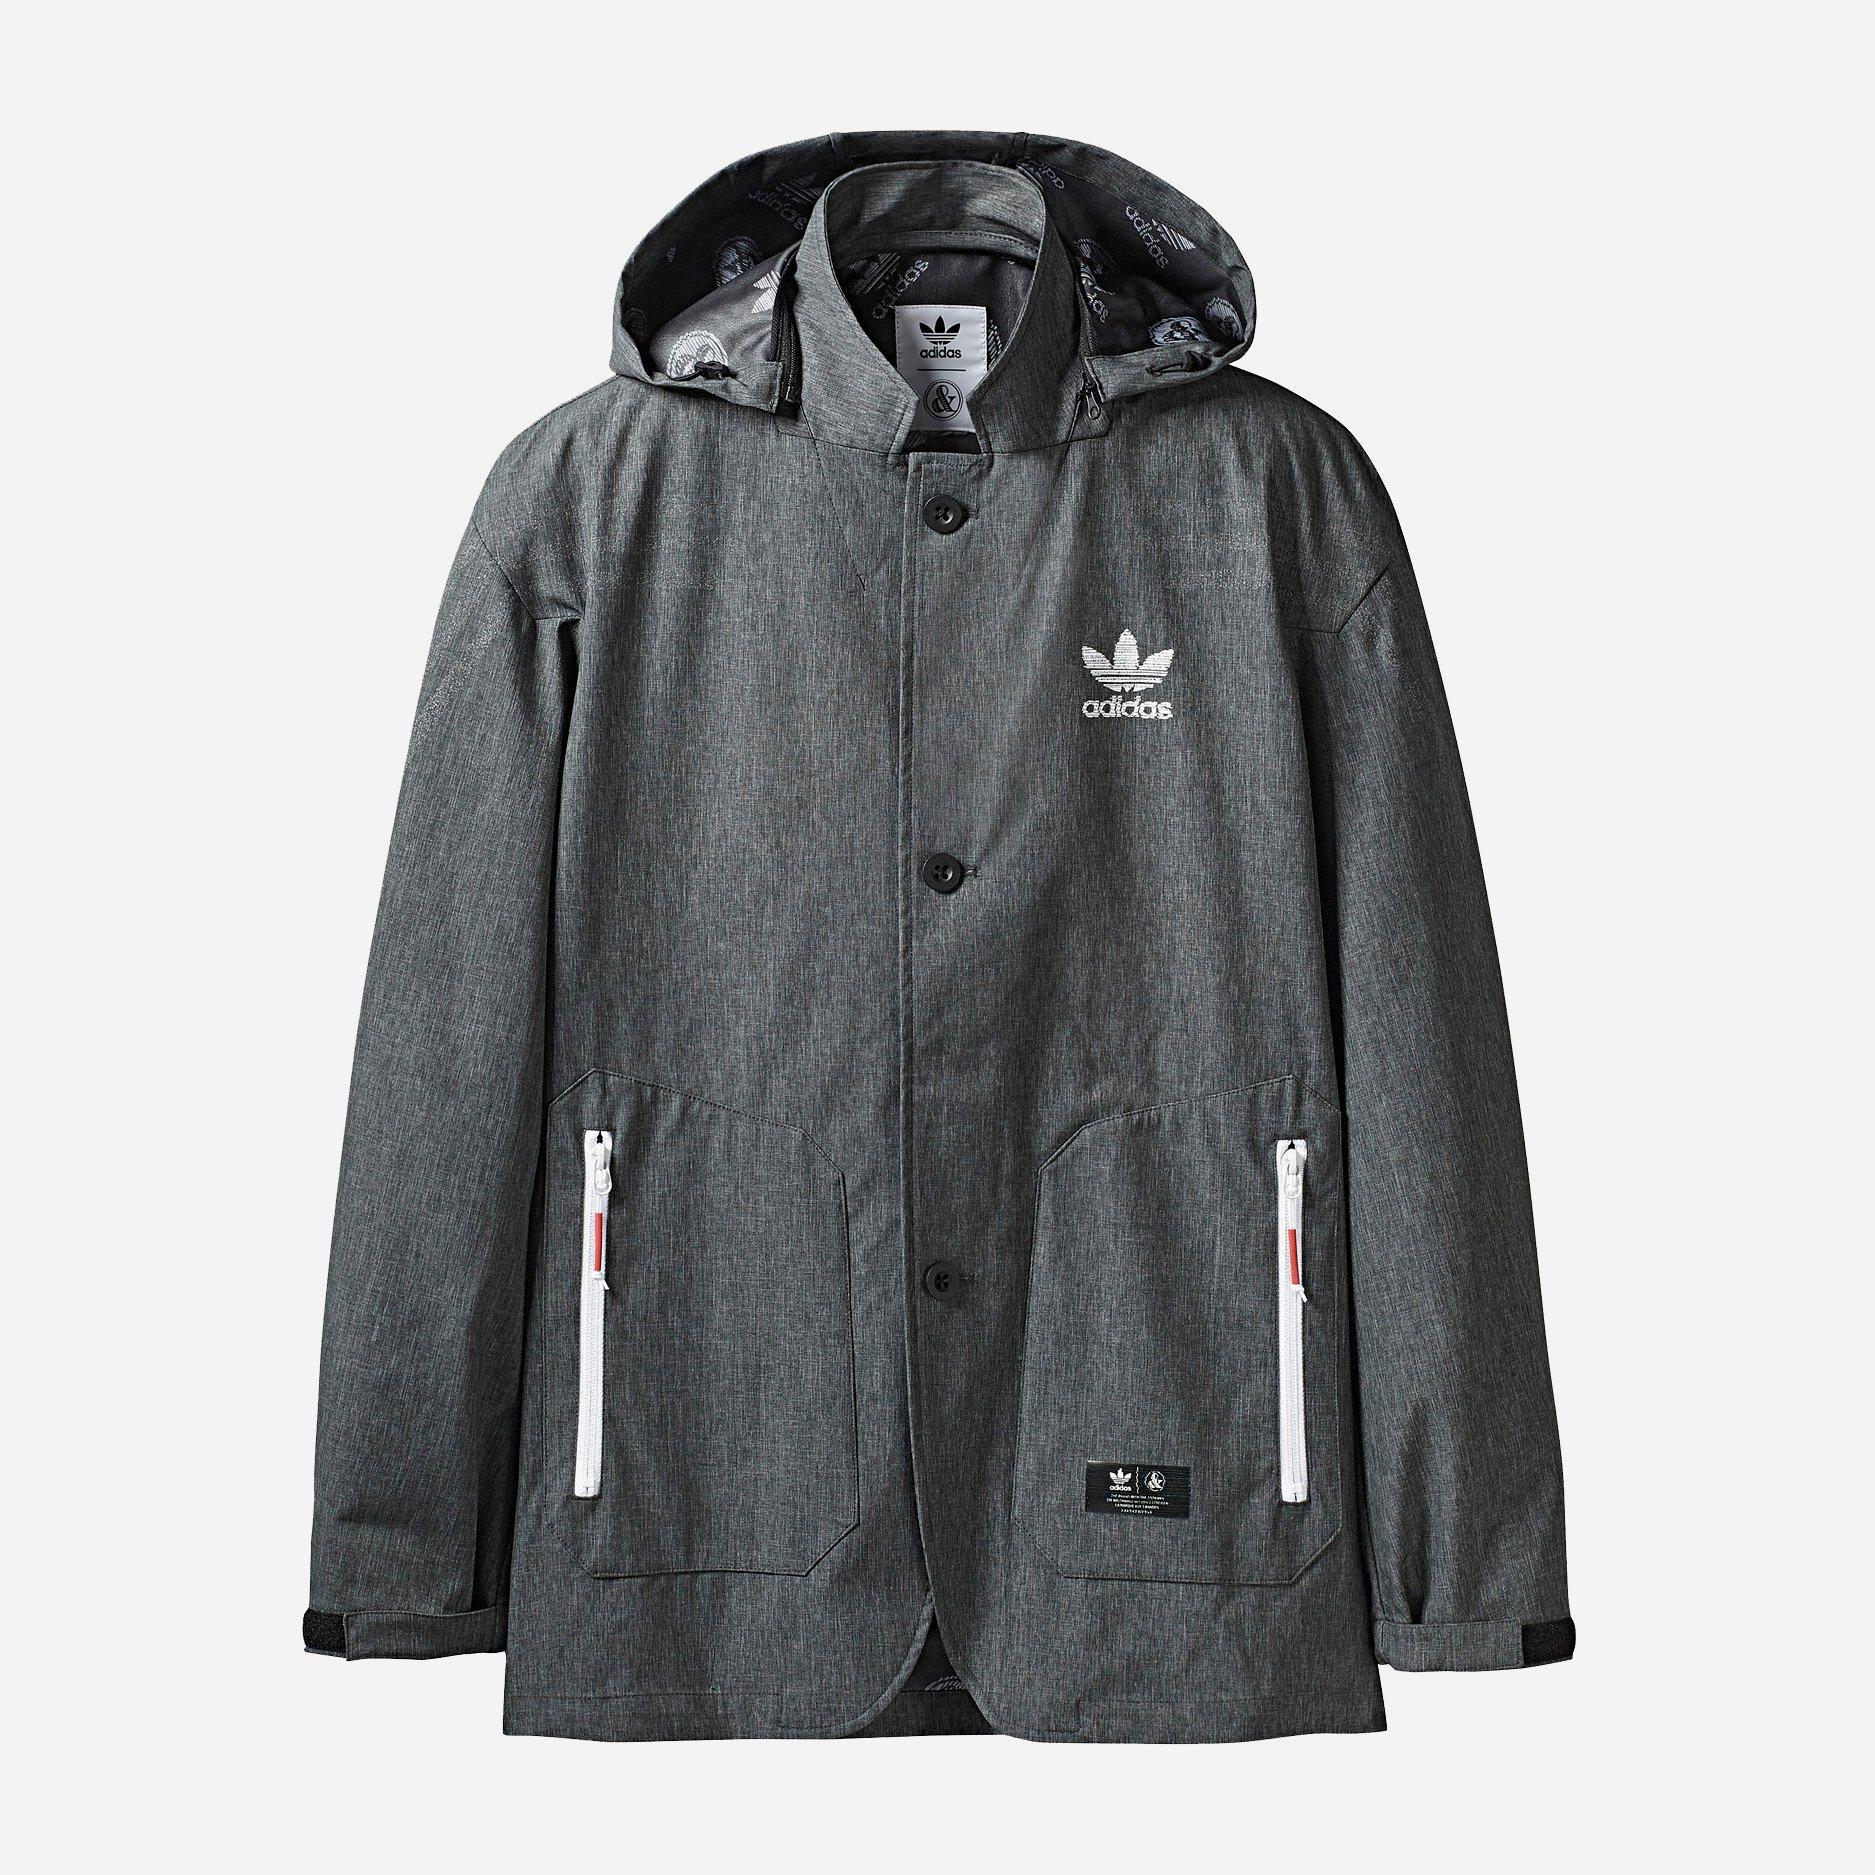 adidas Originals X United Arrows & Sons Urban Jacket